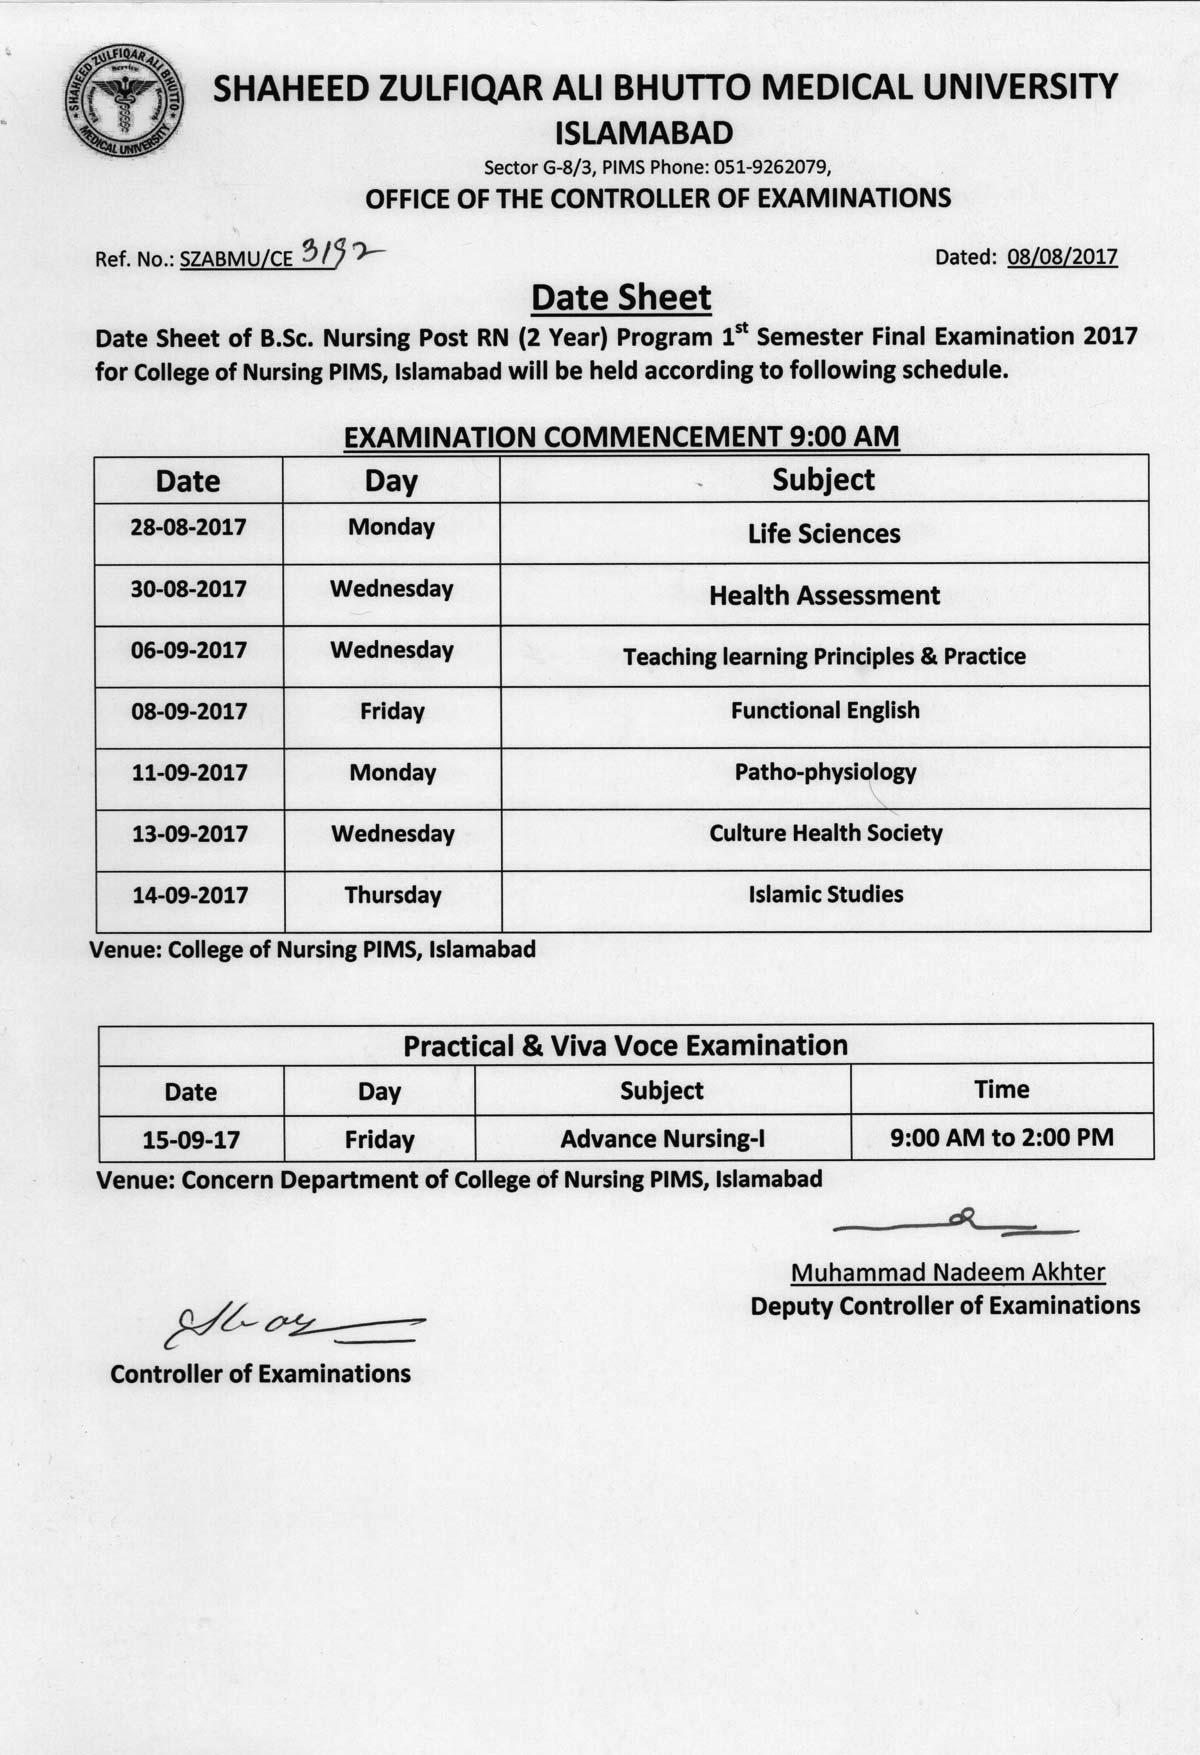 Date sheet - B.Sc. Nursing Post RN 1st Semester Final Exams 2017